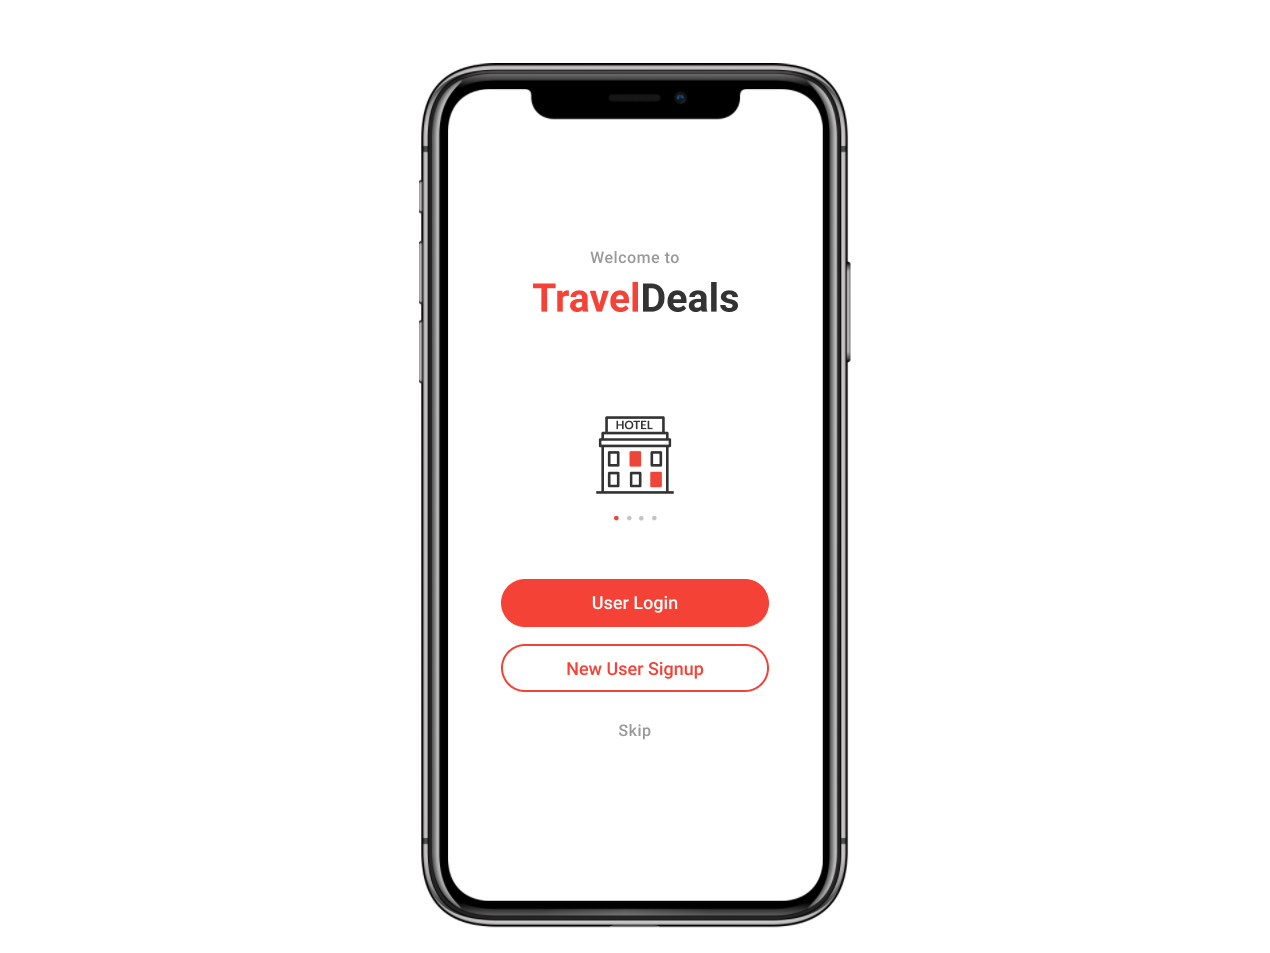 TravelDeals App ( Demo URL in Description) ui mobile app design illustraion design rapid prototyping travel app prototype figma